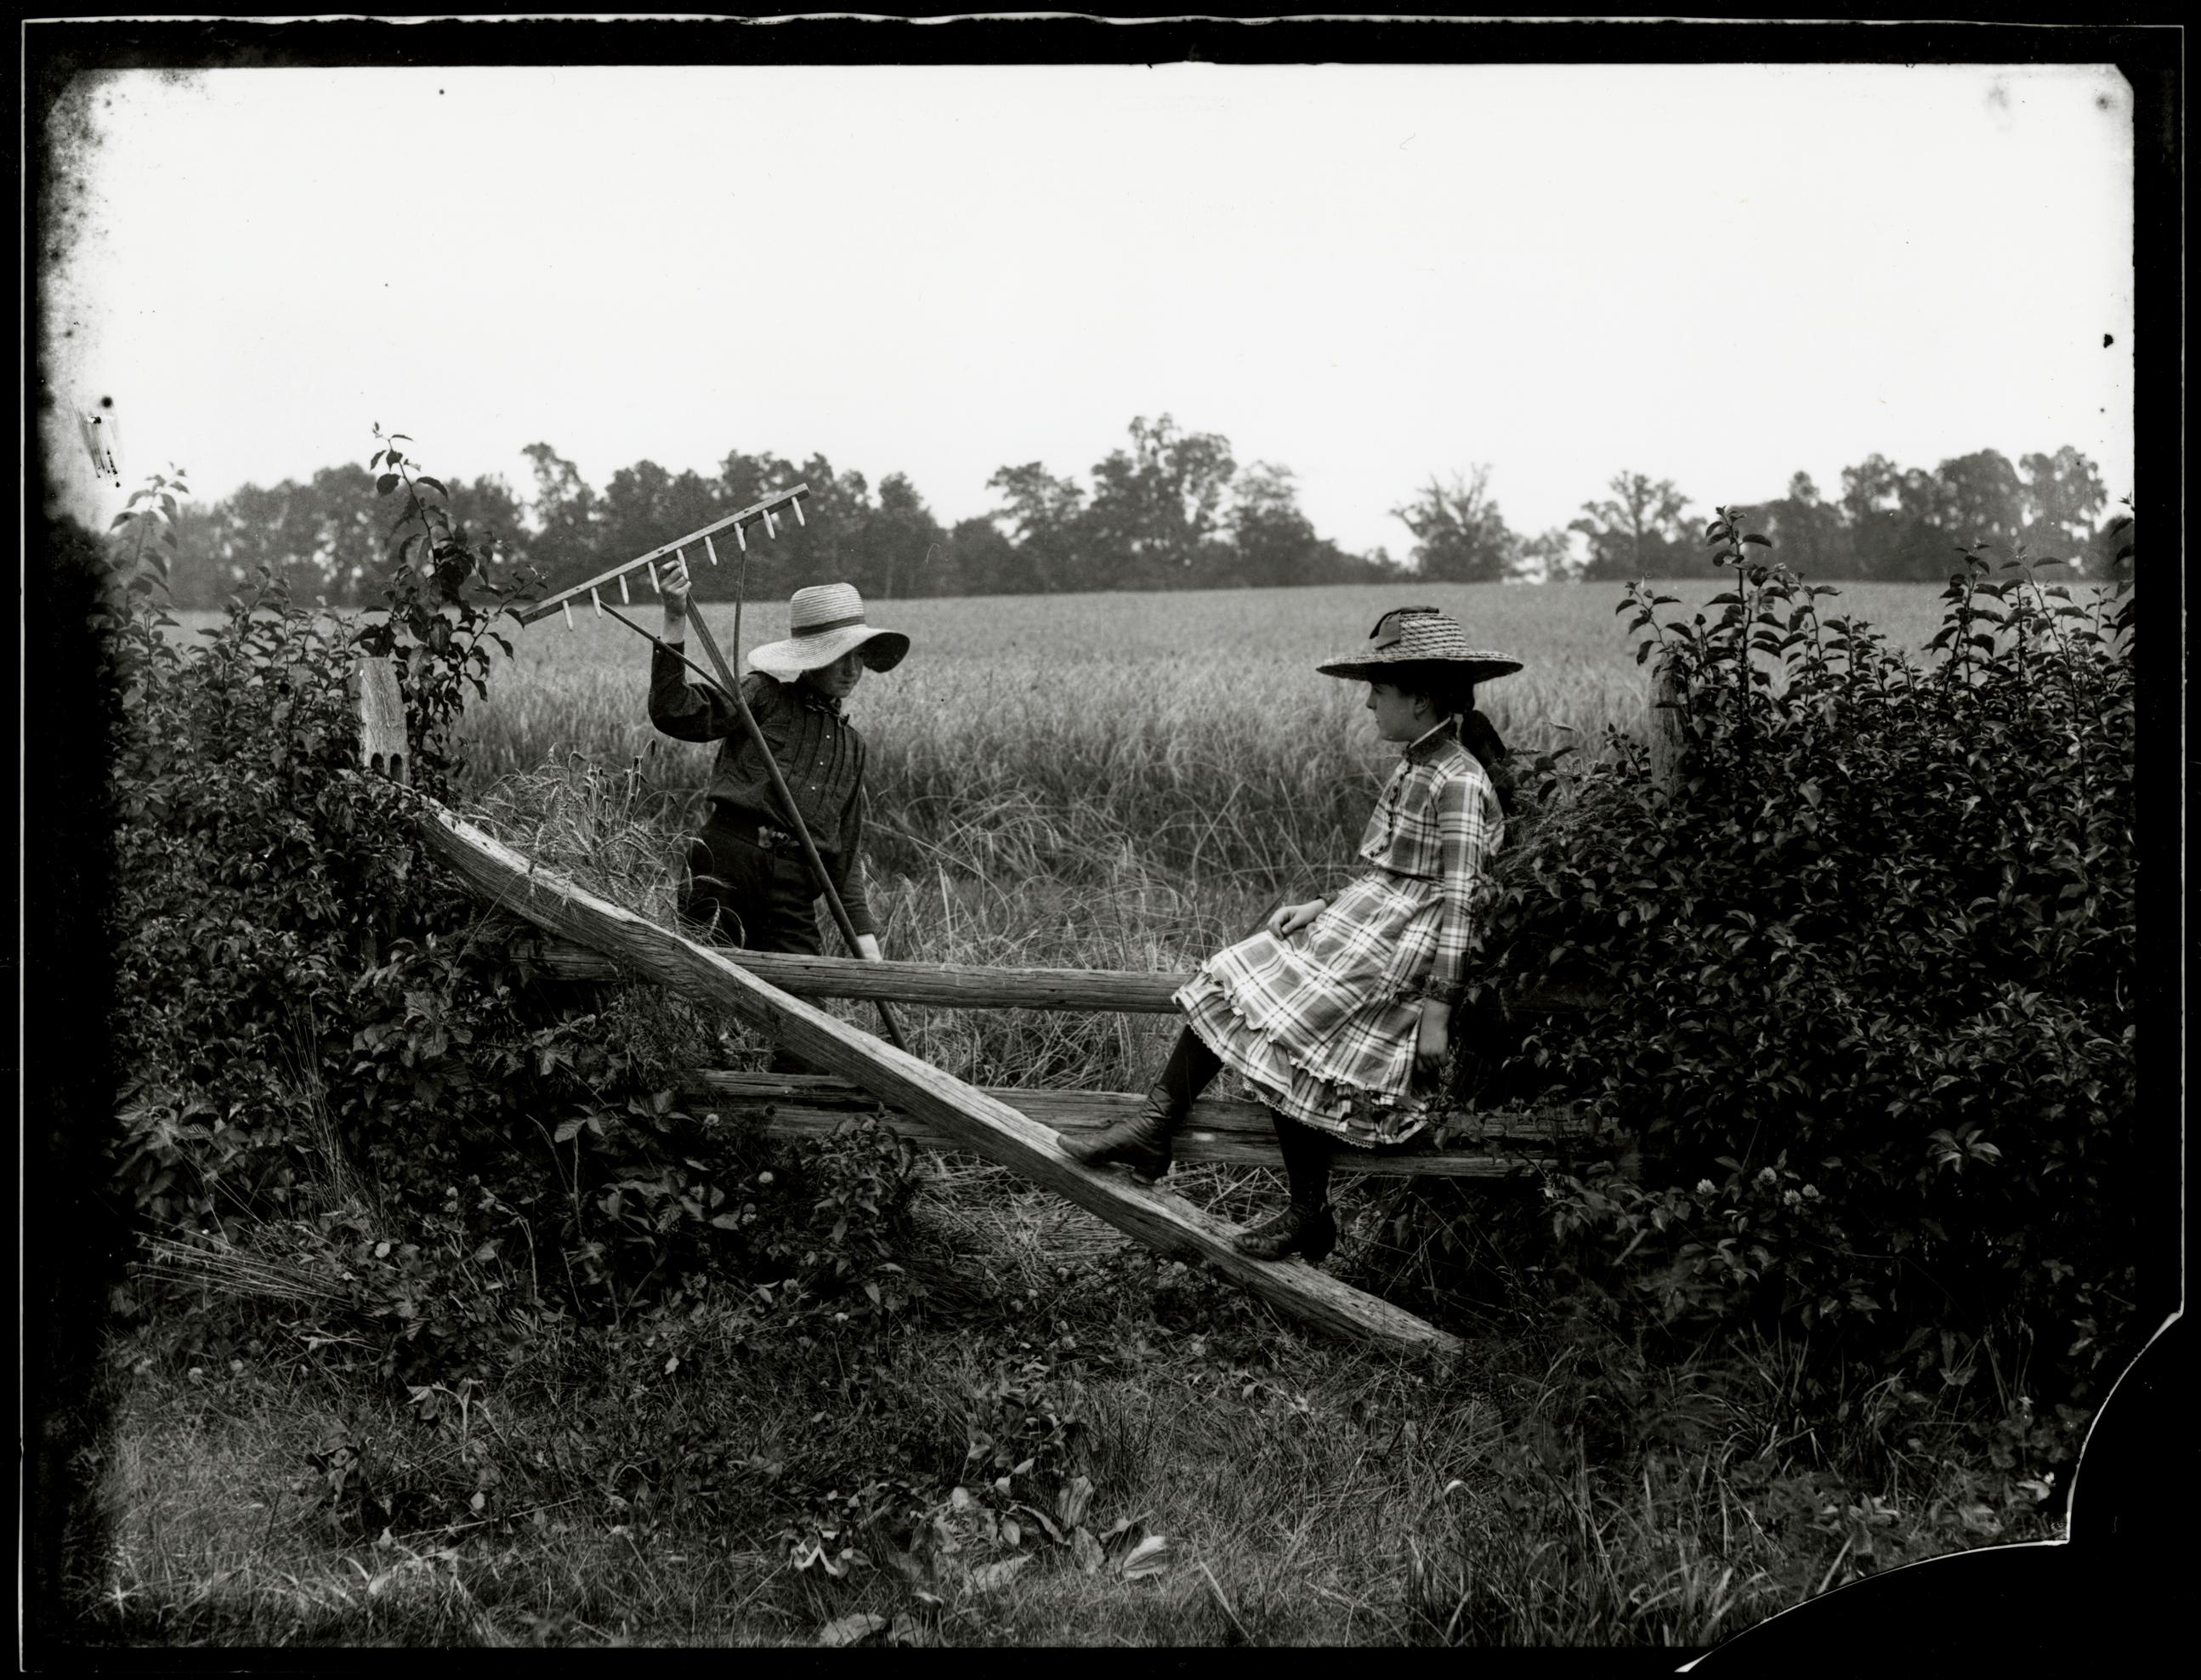 An Idle Moment, On Fence Near Salem, circa 1898 by John G. Bullock